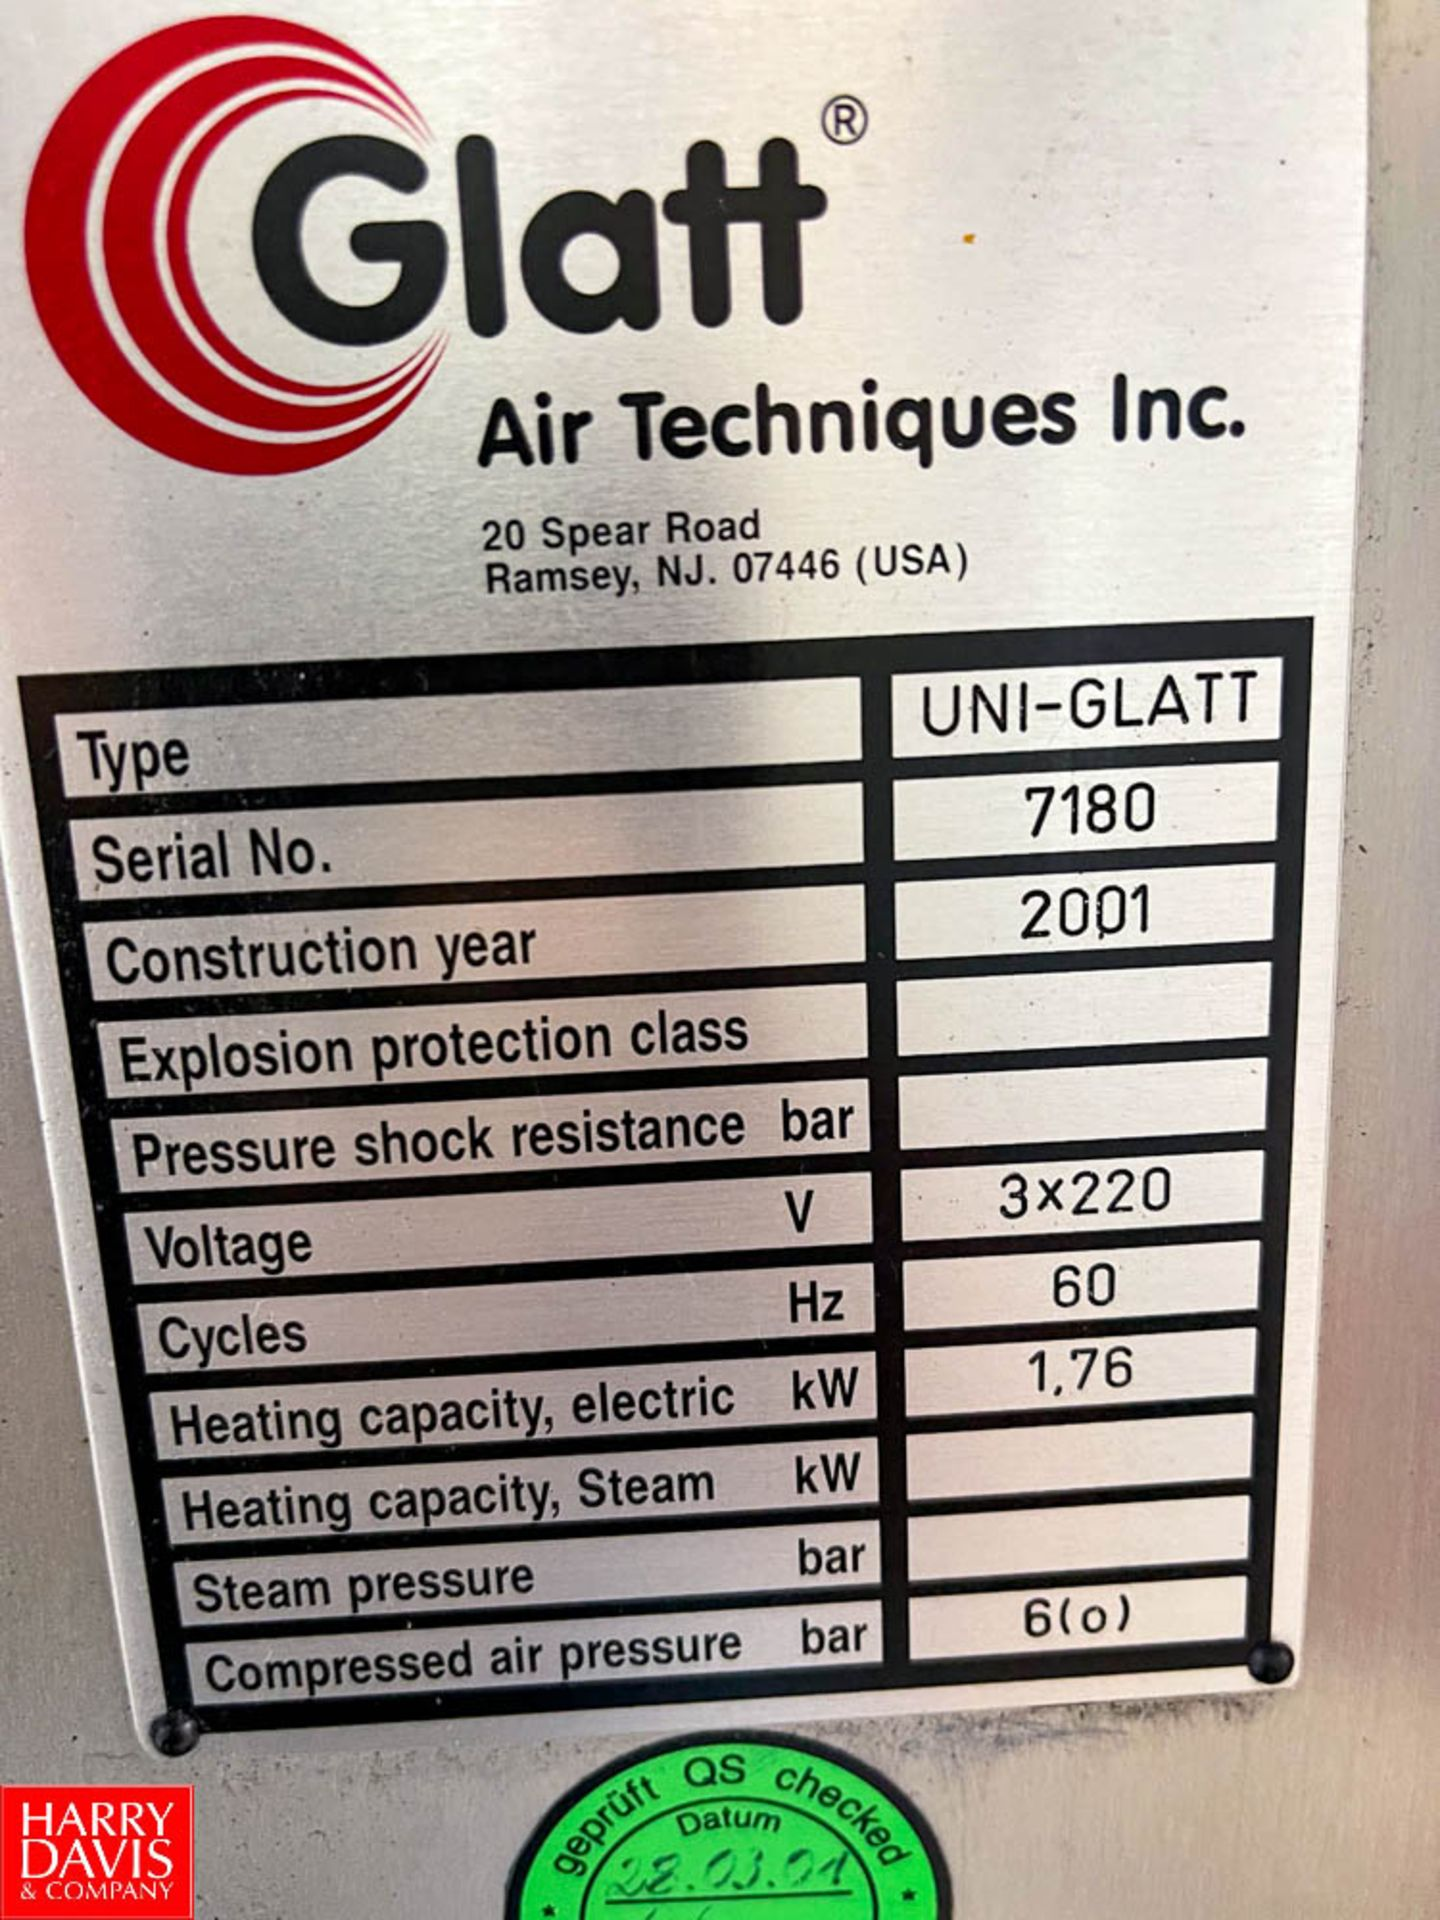 Glatt Air Techniques UNI-GLATT - Image 2 of 2